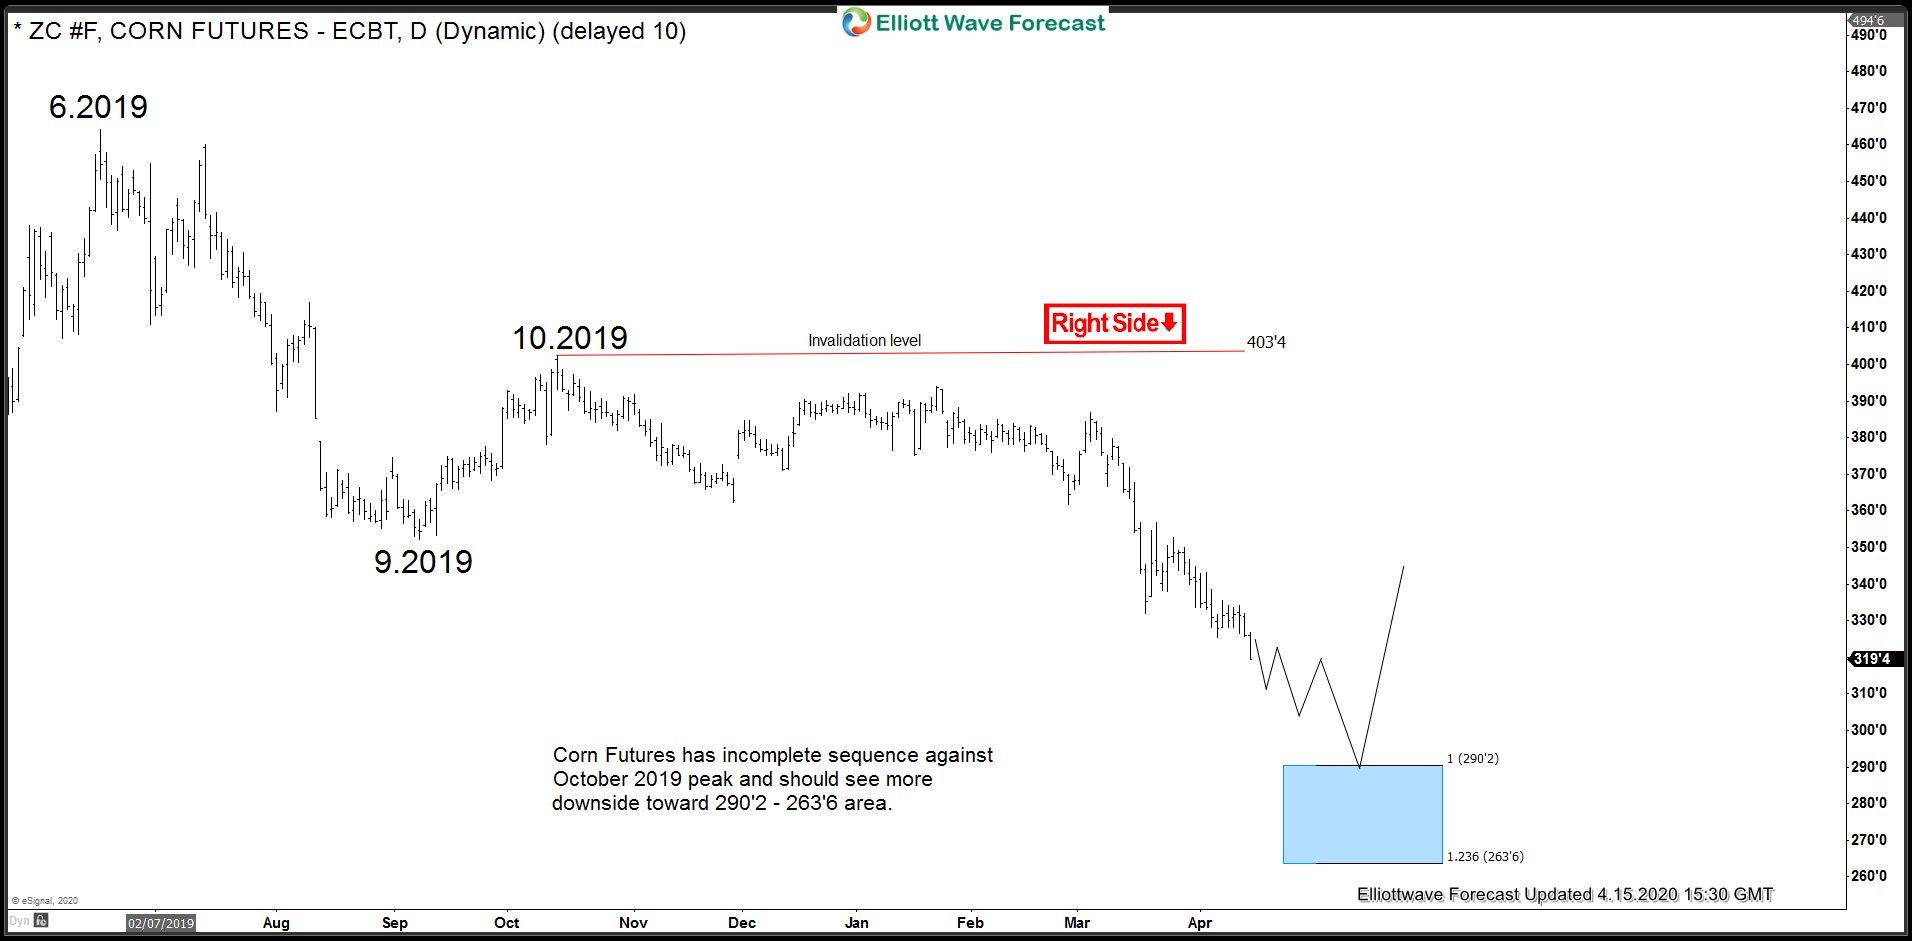 ZC_F (Corn Futures) Incomplete Elliott wave sequence